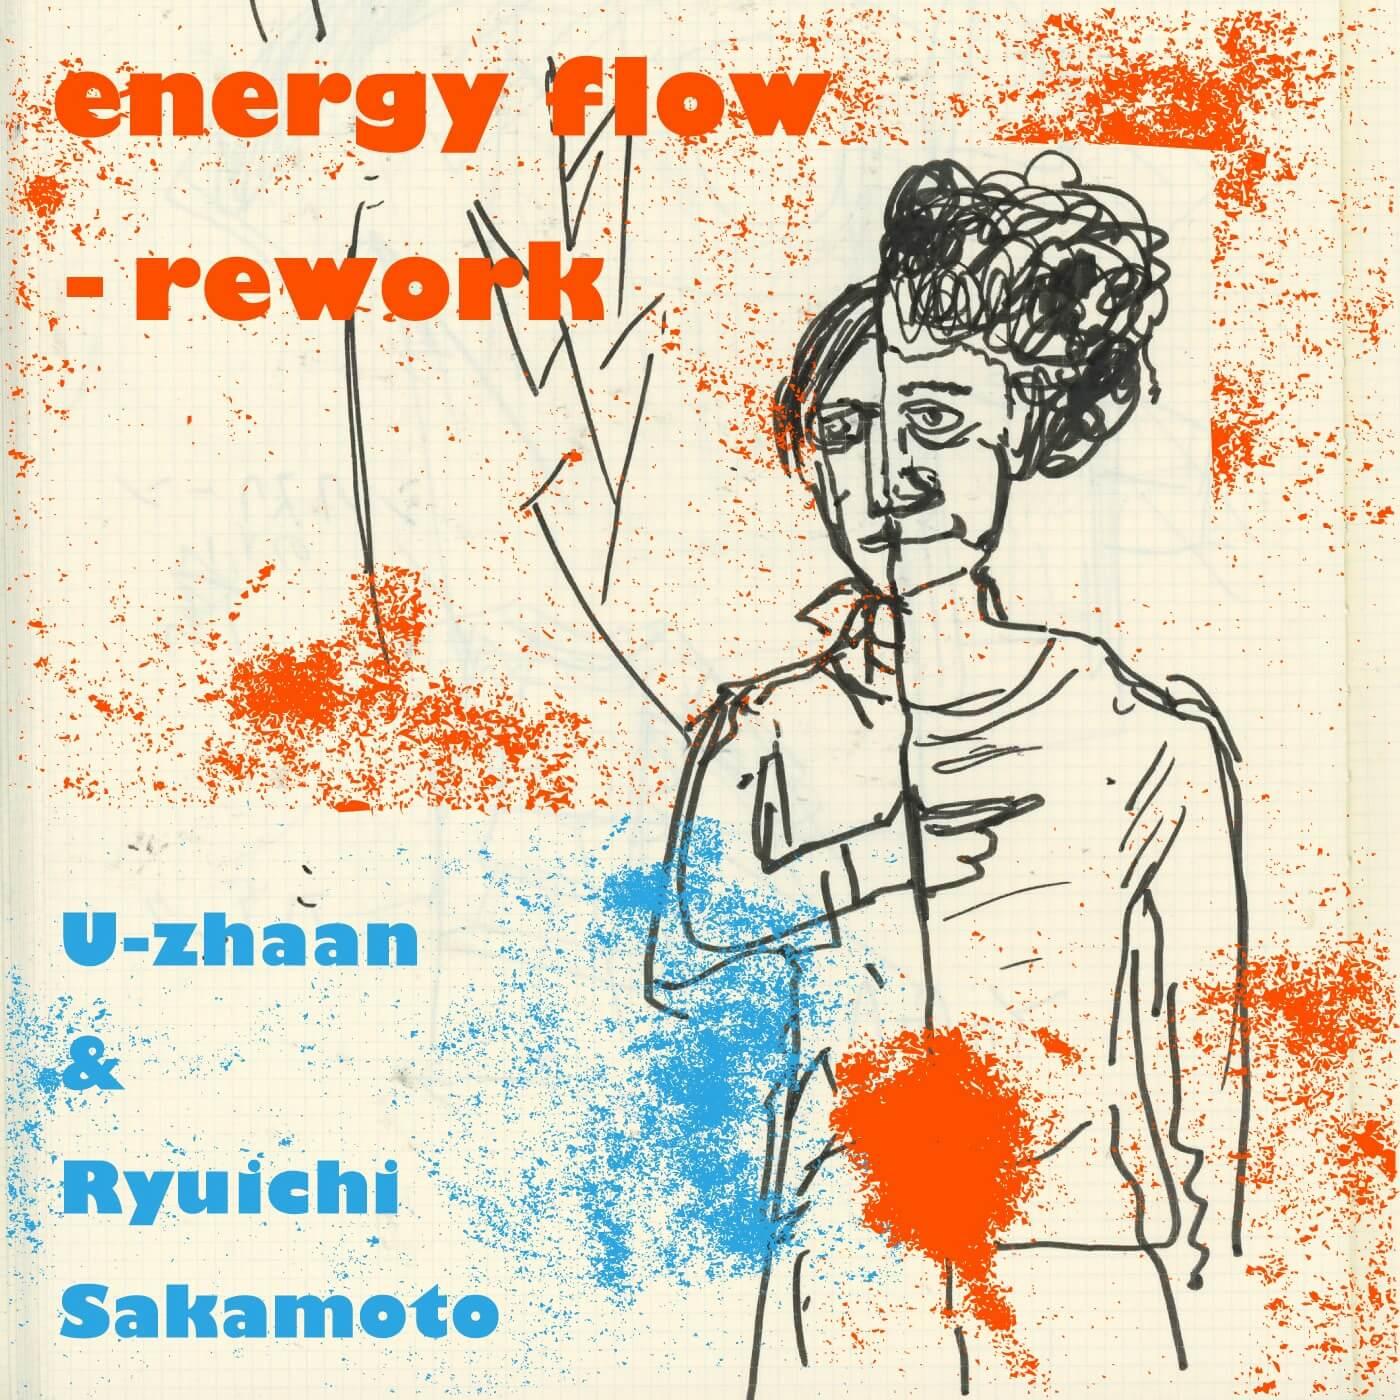 U-zhaanと坂本龍一による「energy flow」の新解釈「energy flow – rework」リリースサムネイル画像